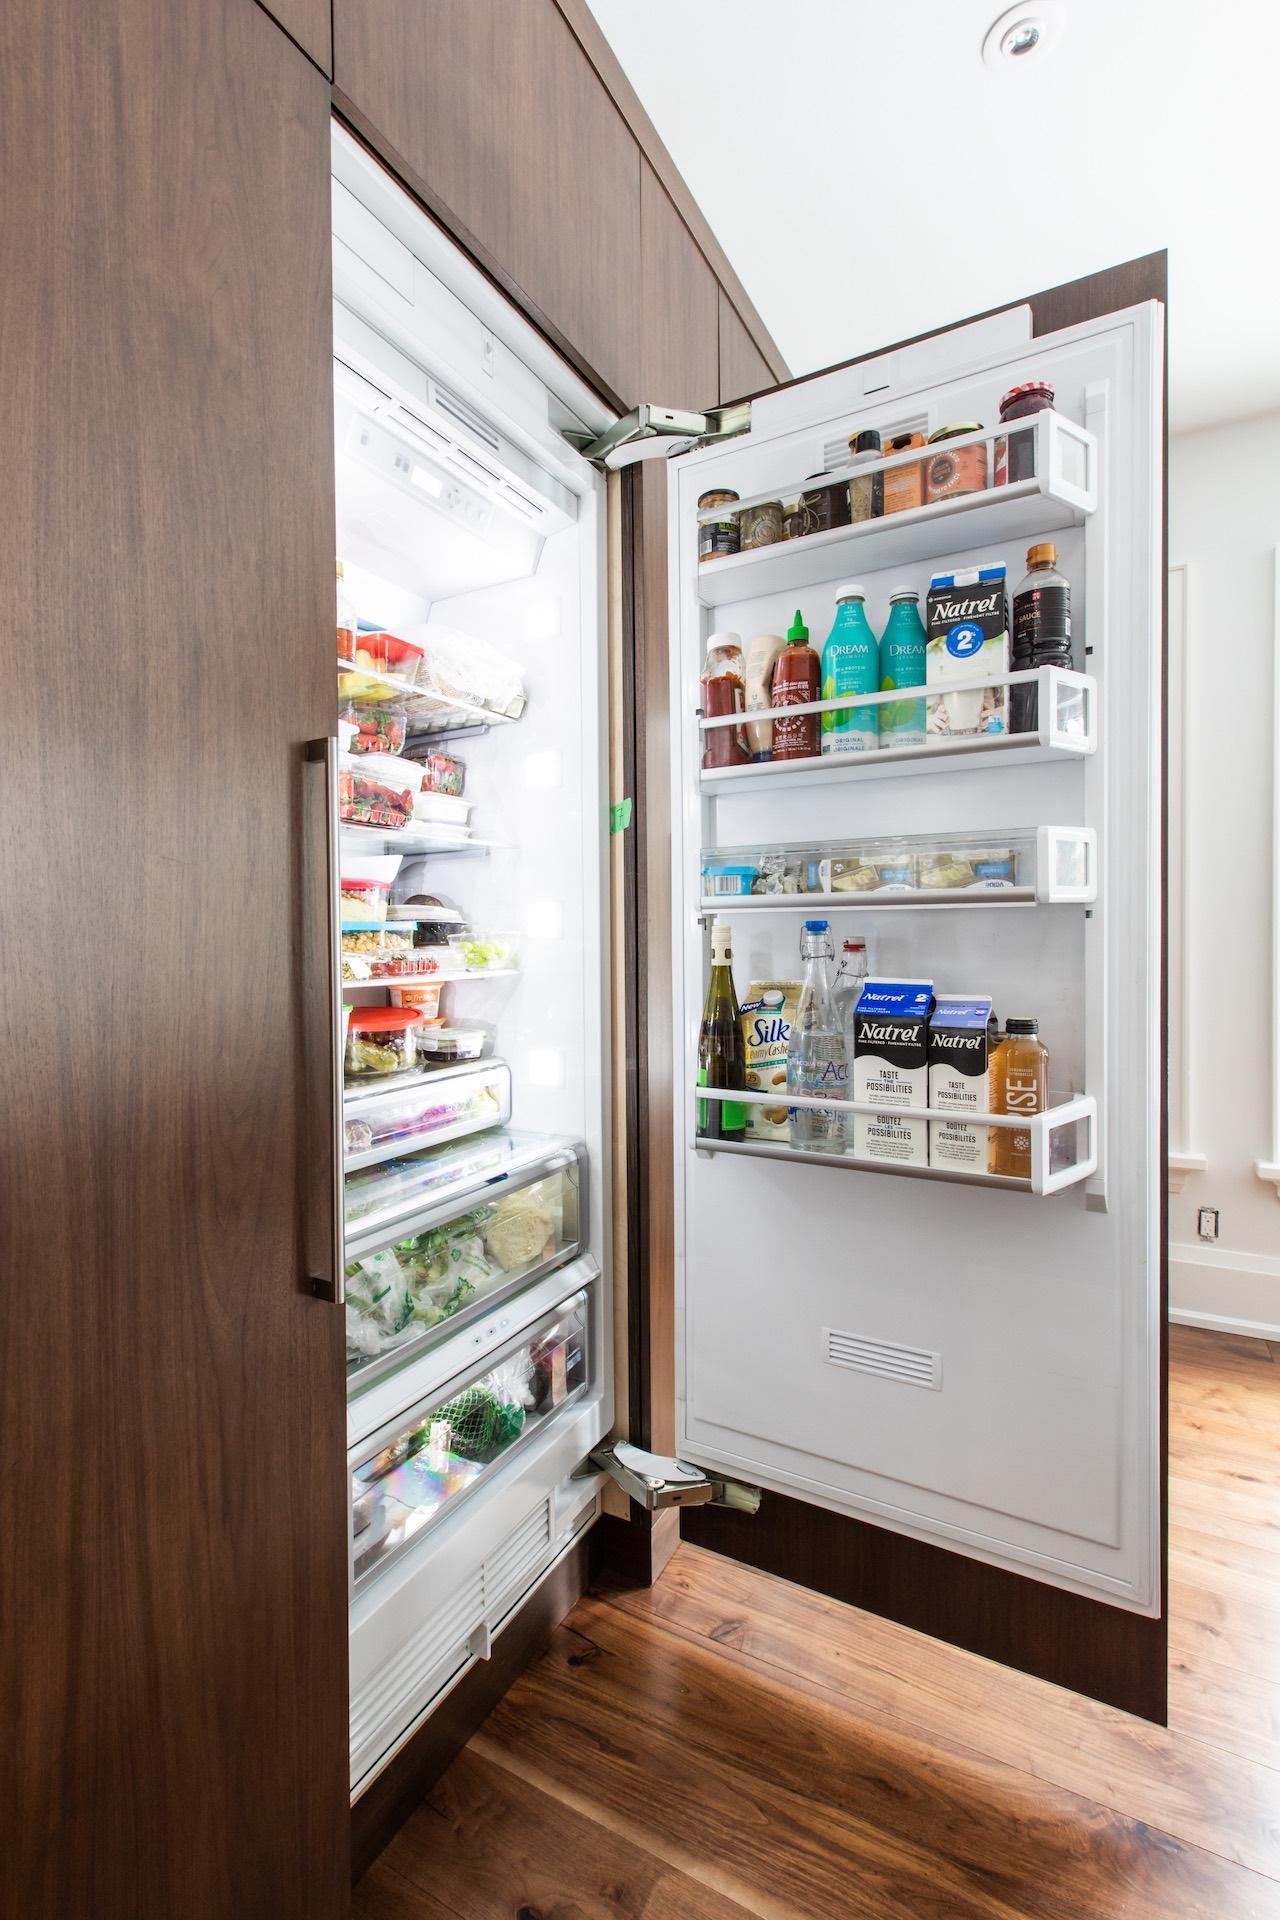 wood with fridge open